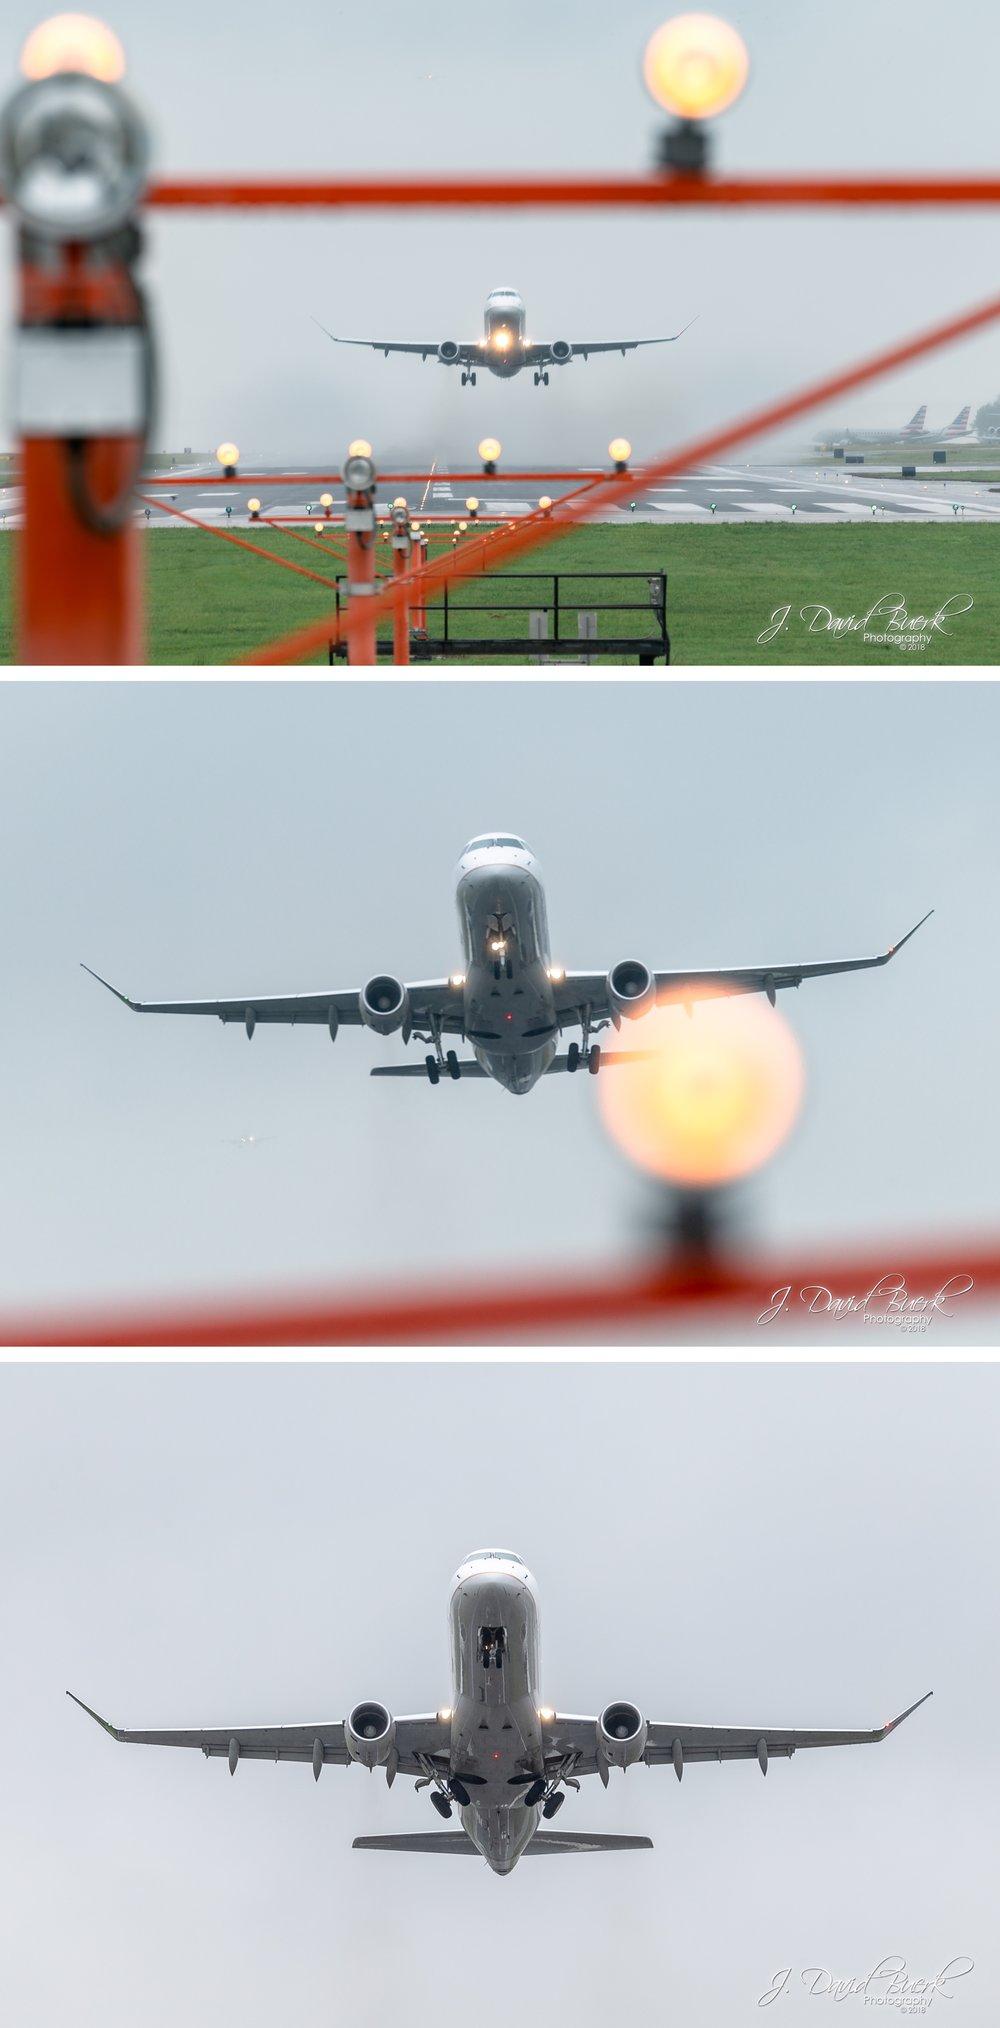 20180517 DCA Planespotting 2.jpg